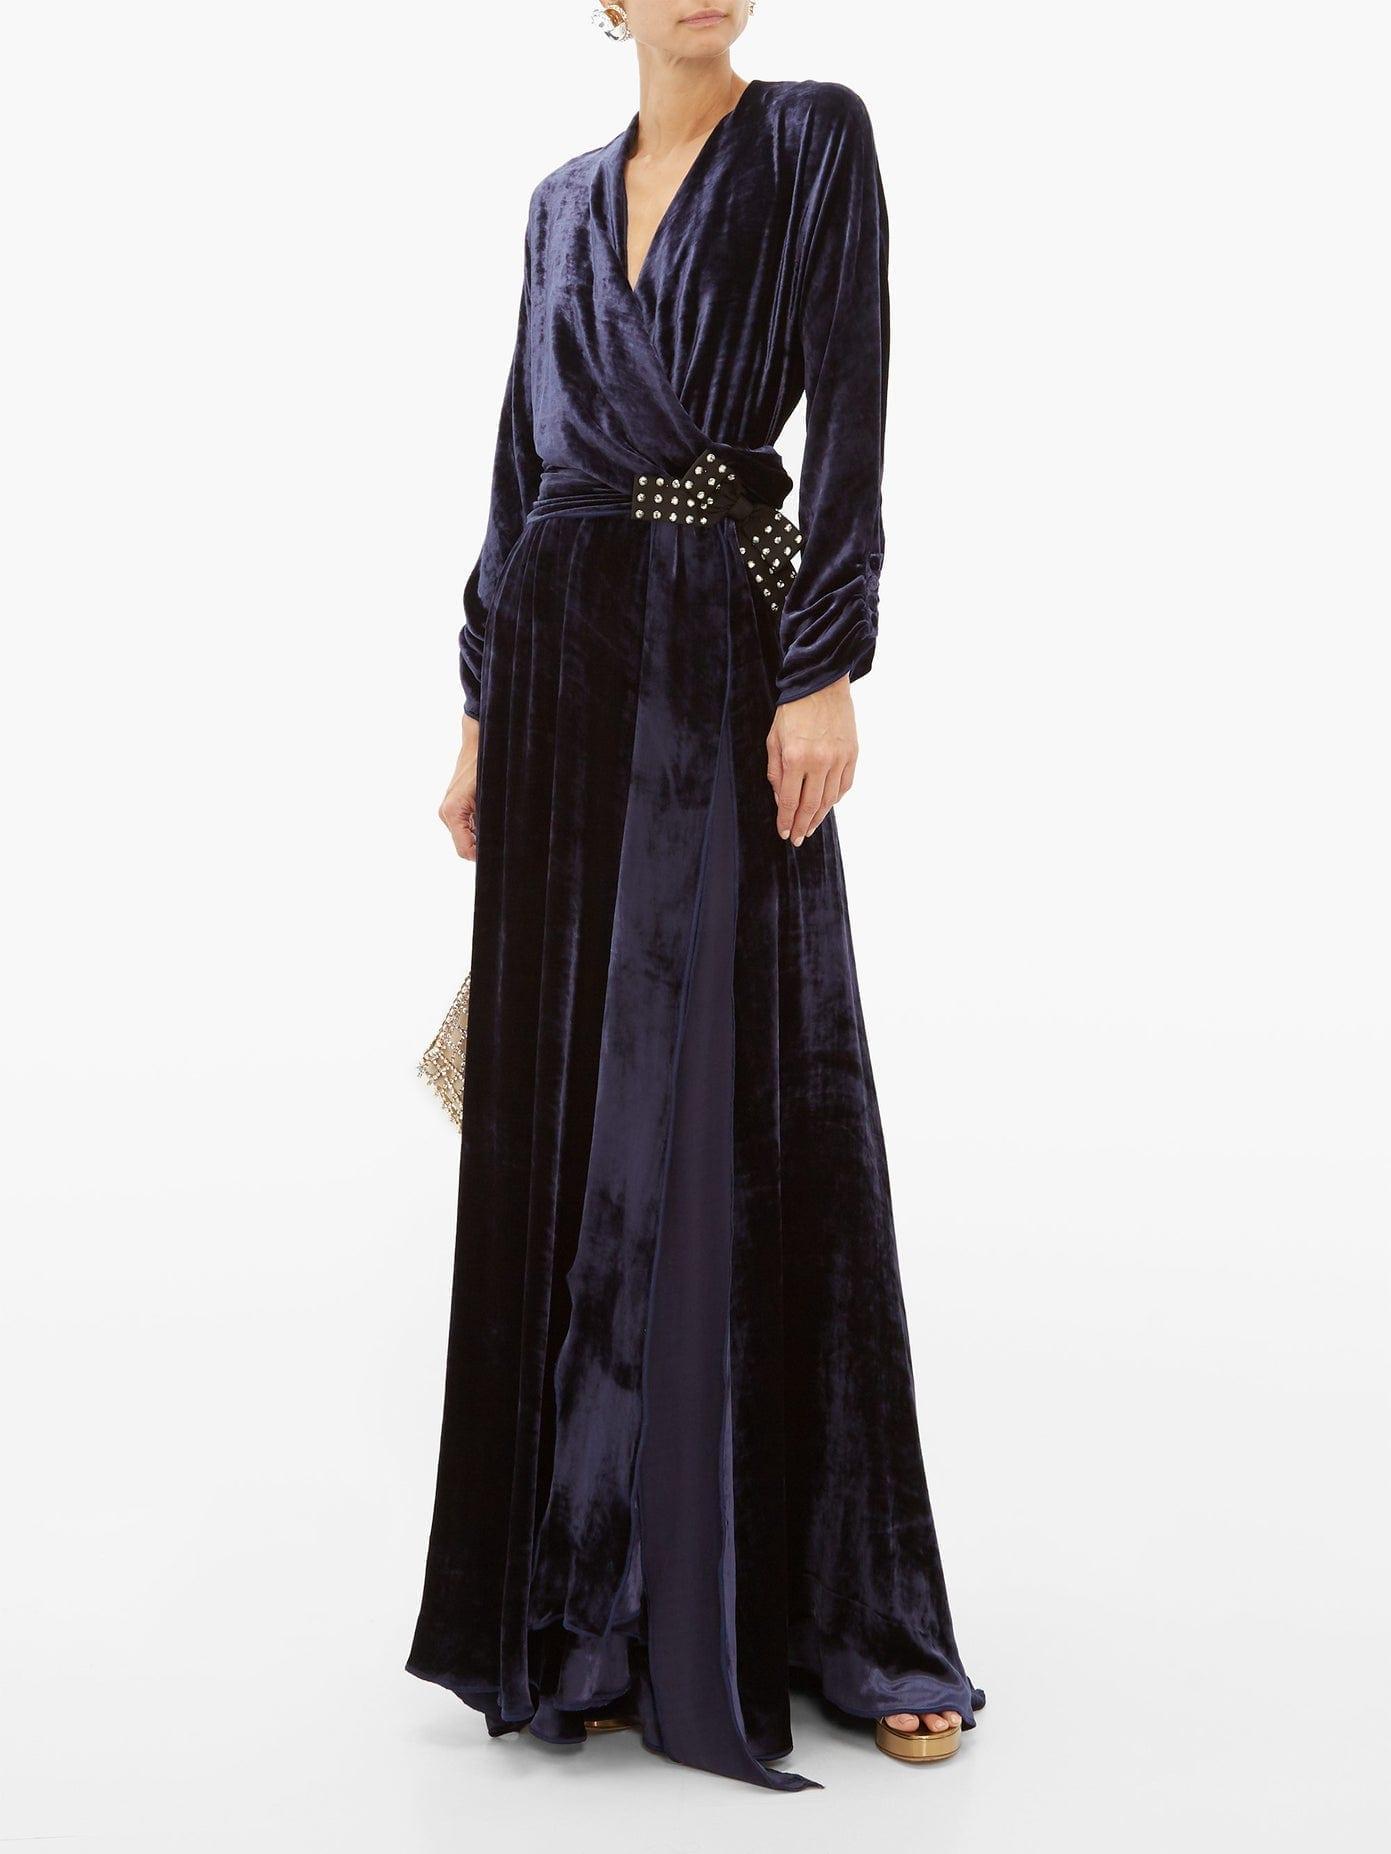 MARIA LUCIA HOHAN Kamelia Polka-dot Bow Velvet Wrap Dress